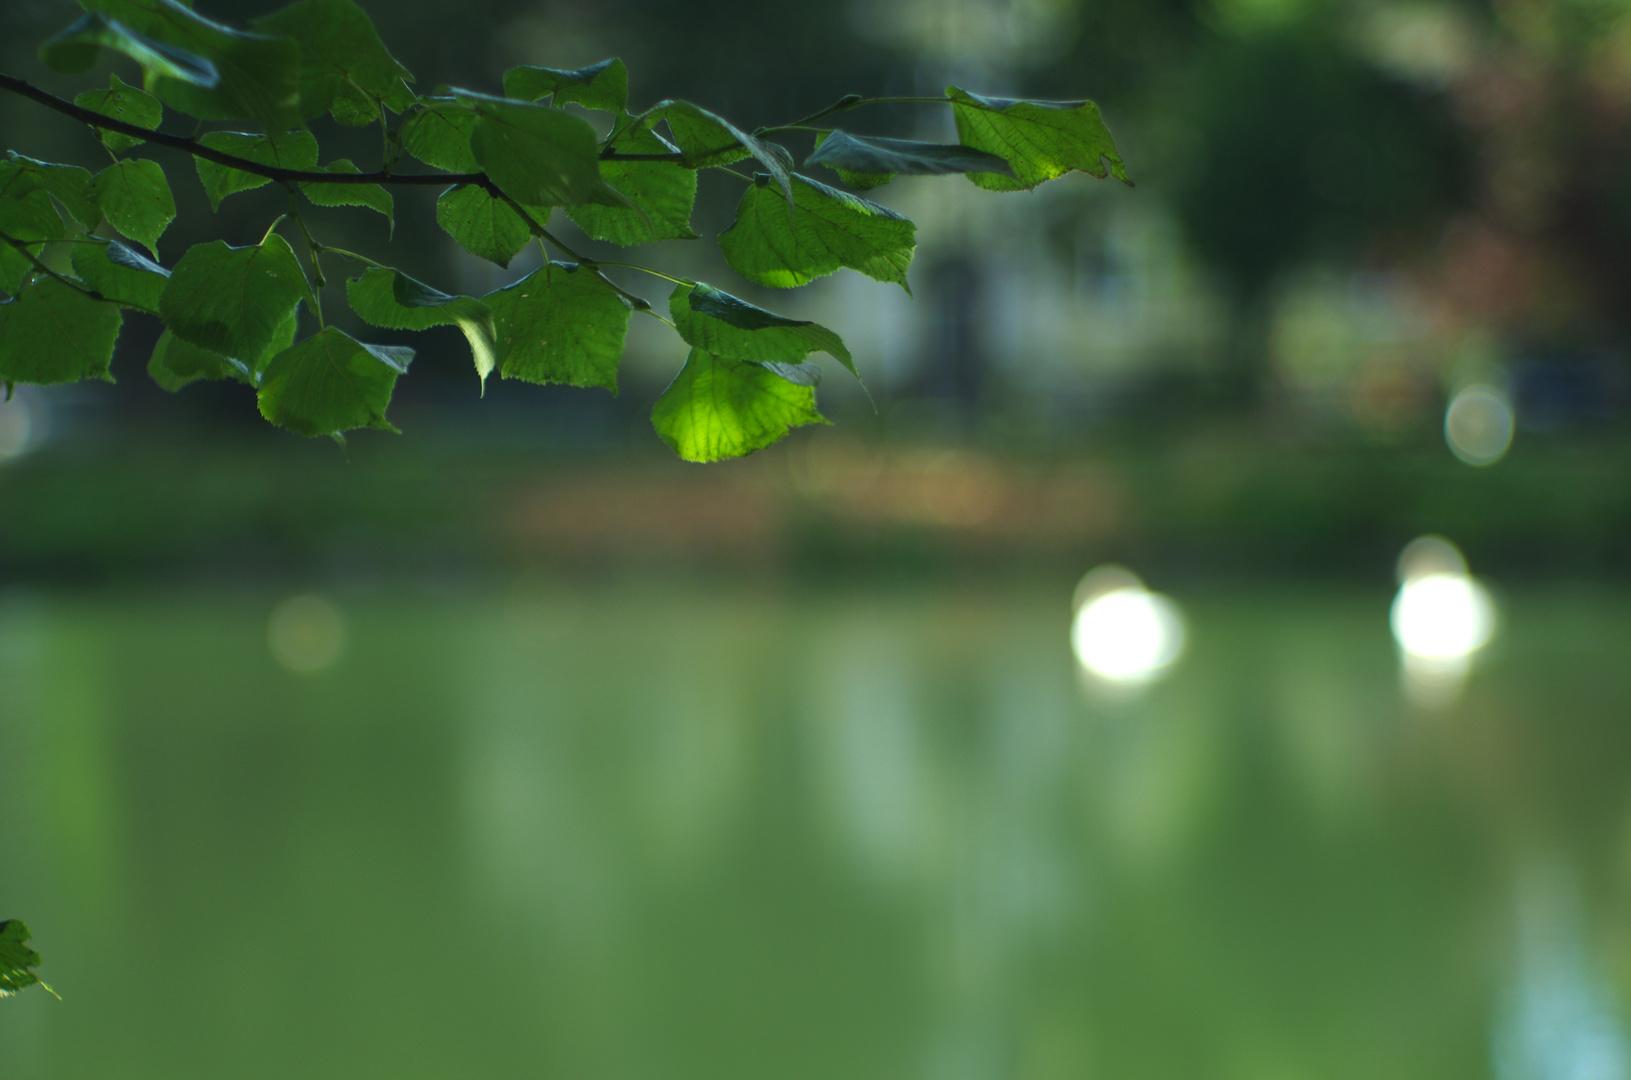 Laubgrün vs. Wassergrün